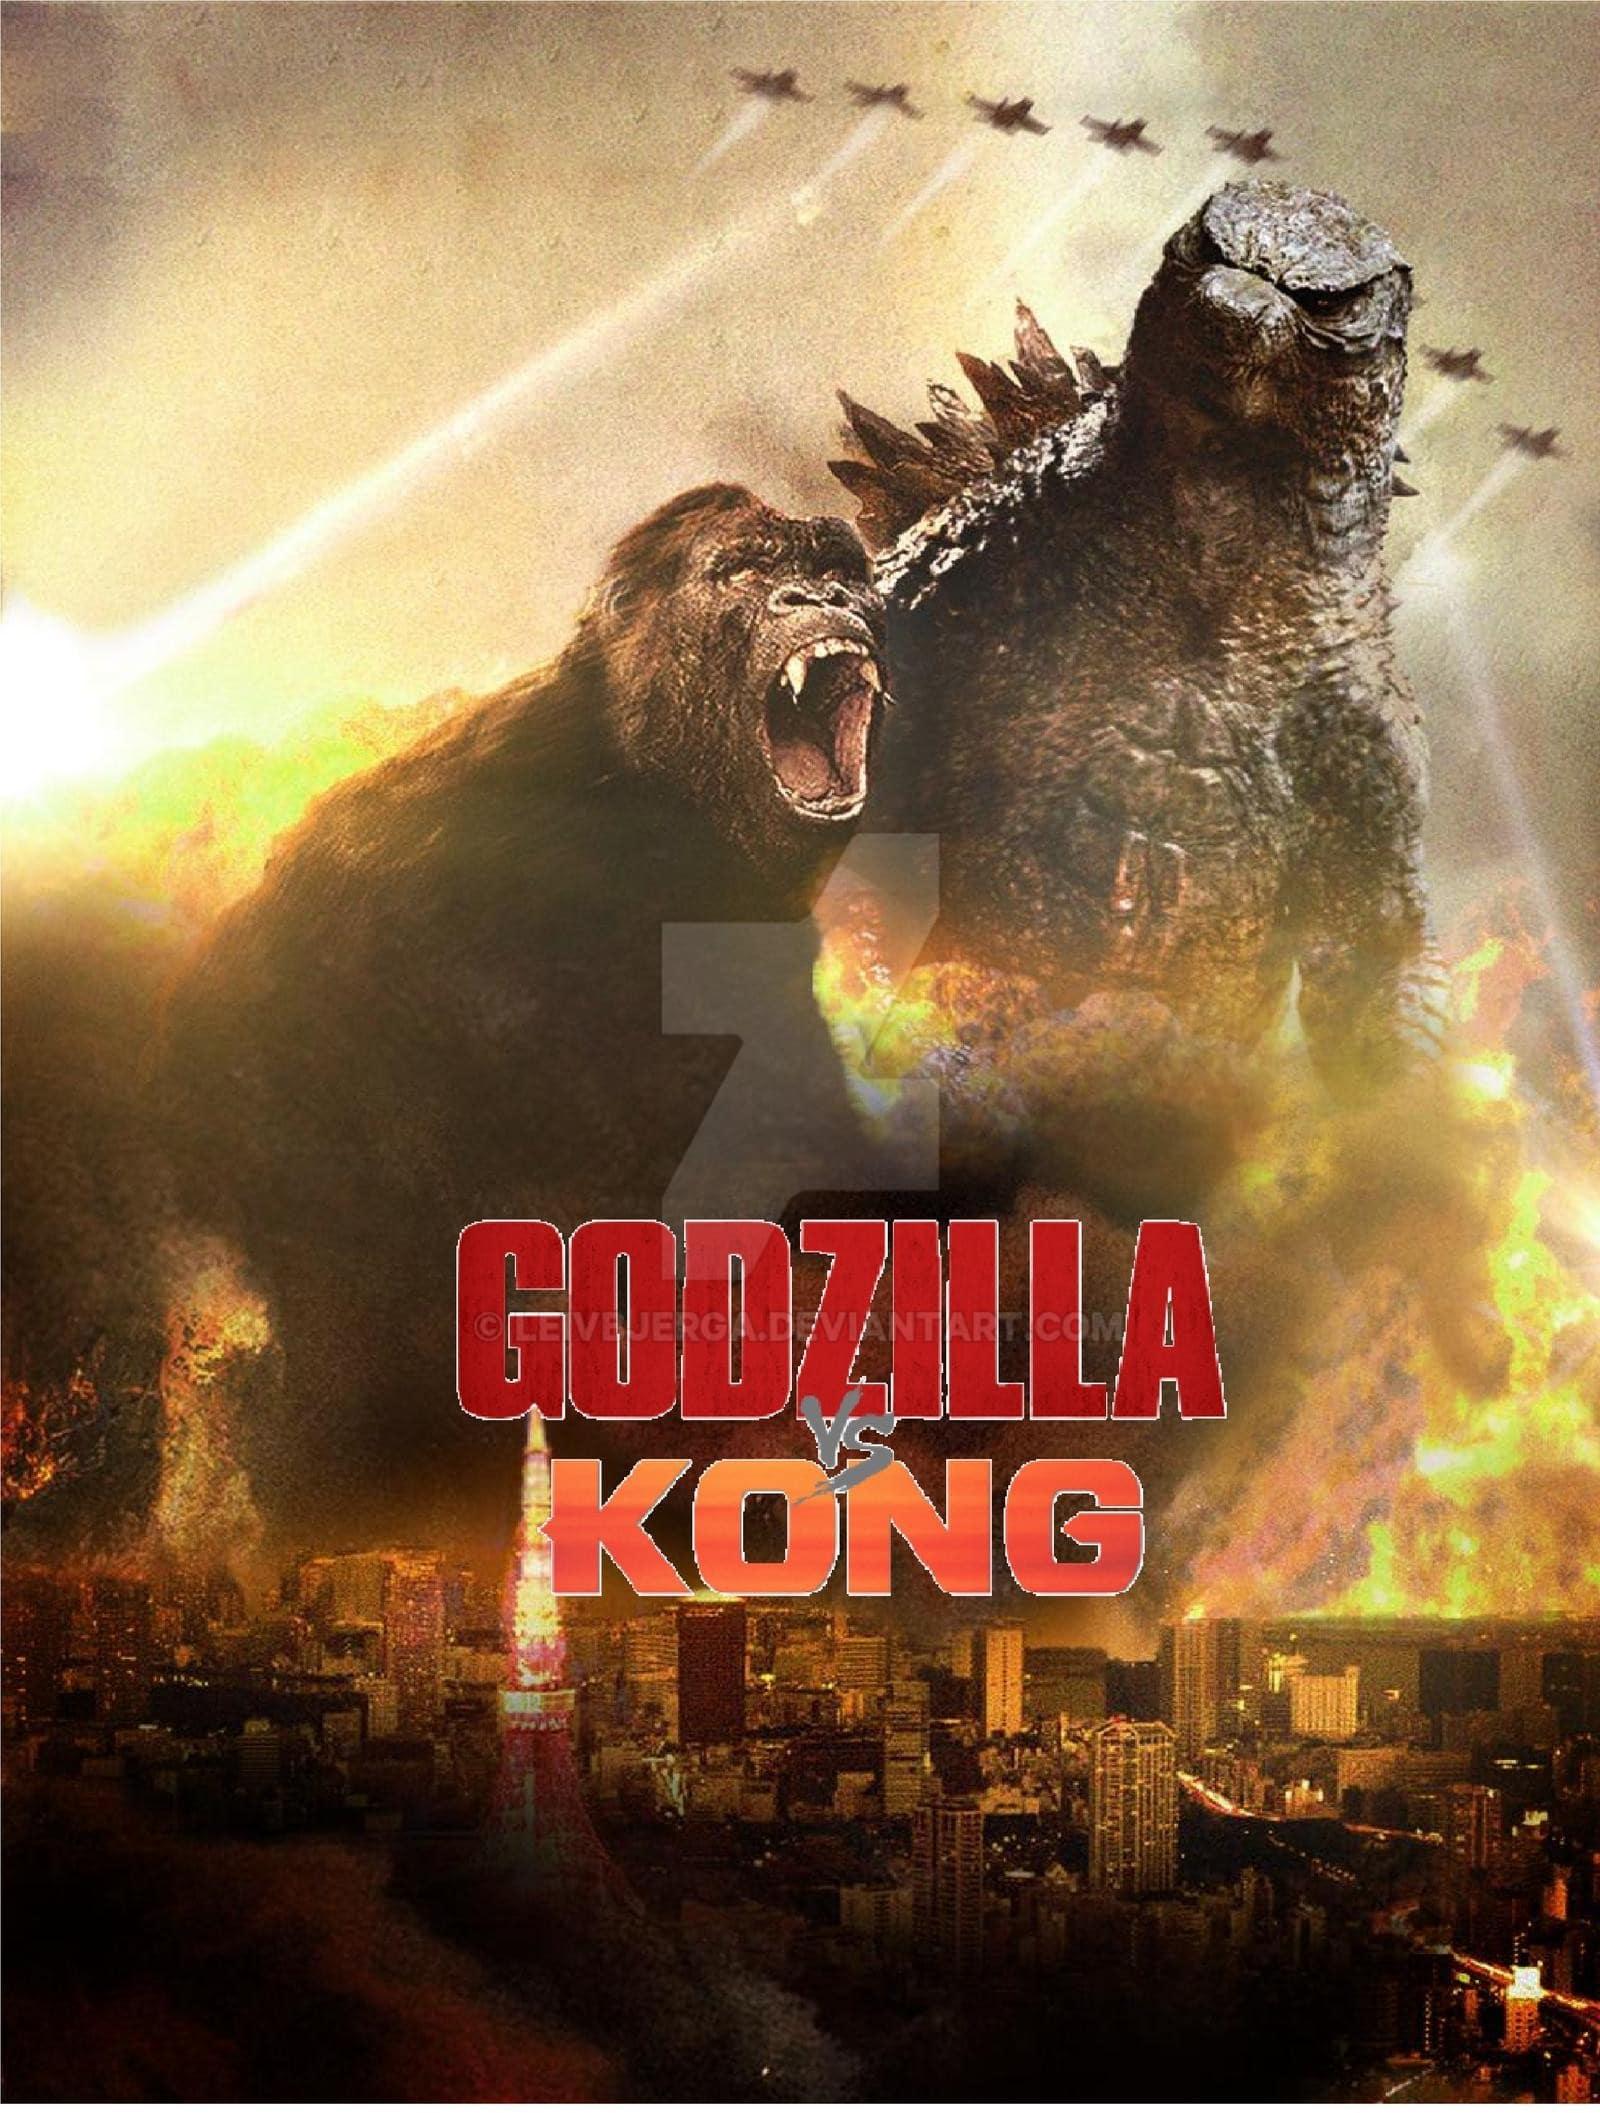 Kong Vs Godzilla Wallpapers Wallpaper Cave